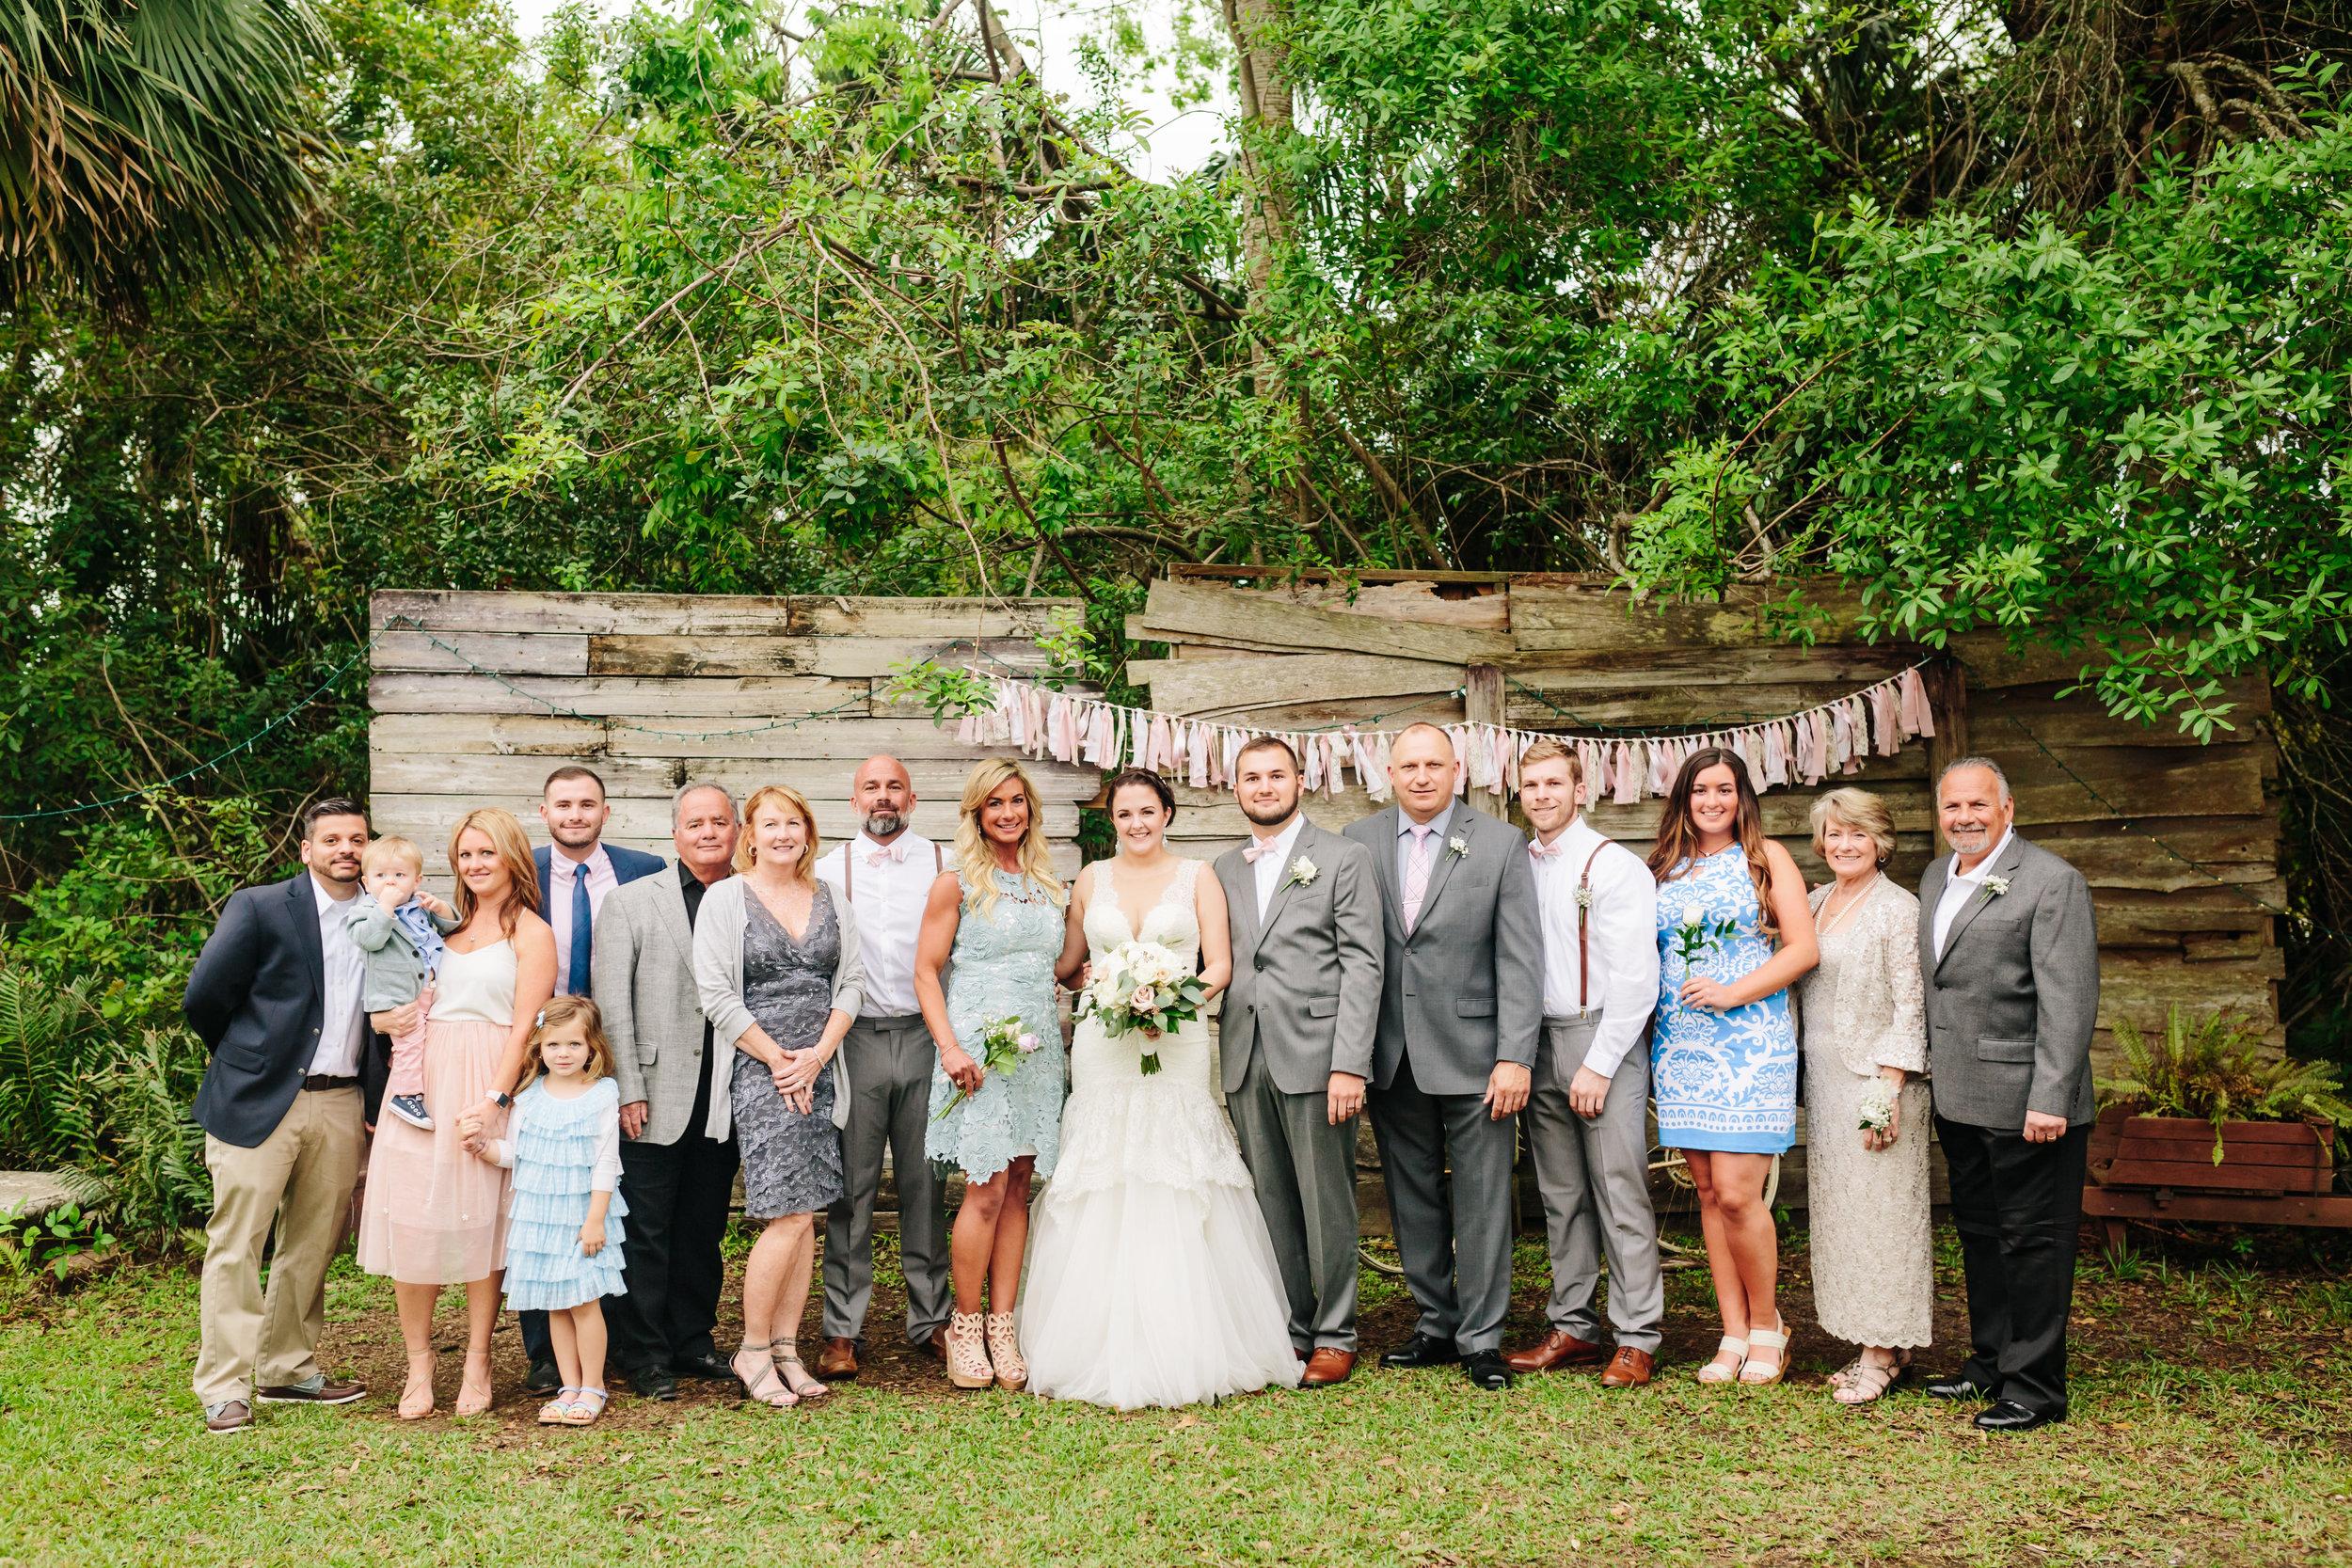 Kaleb and Cole Swancott Birdsong Barn Wedding (342 of 545).jpg